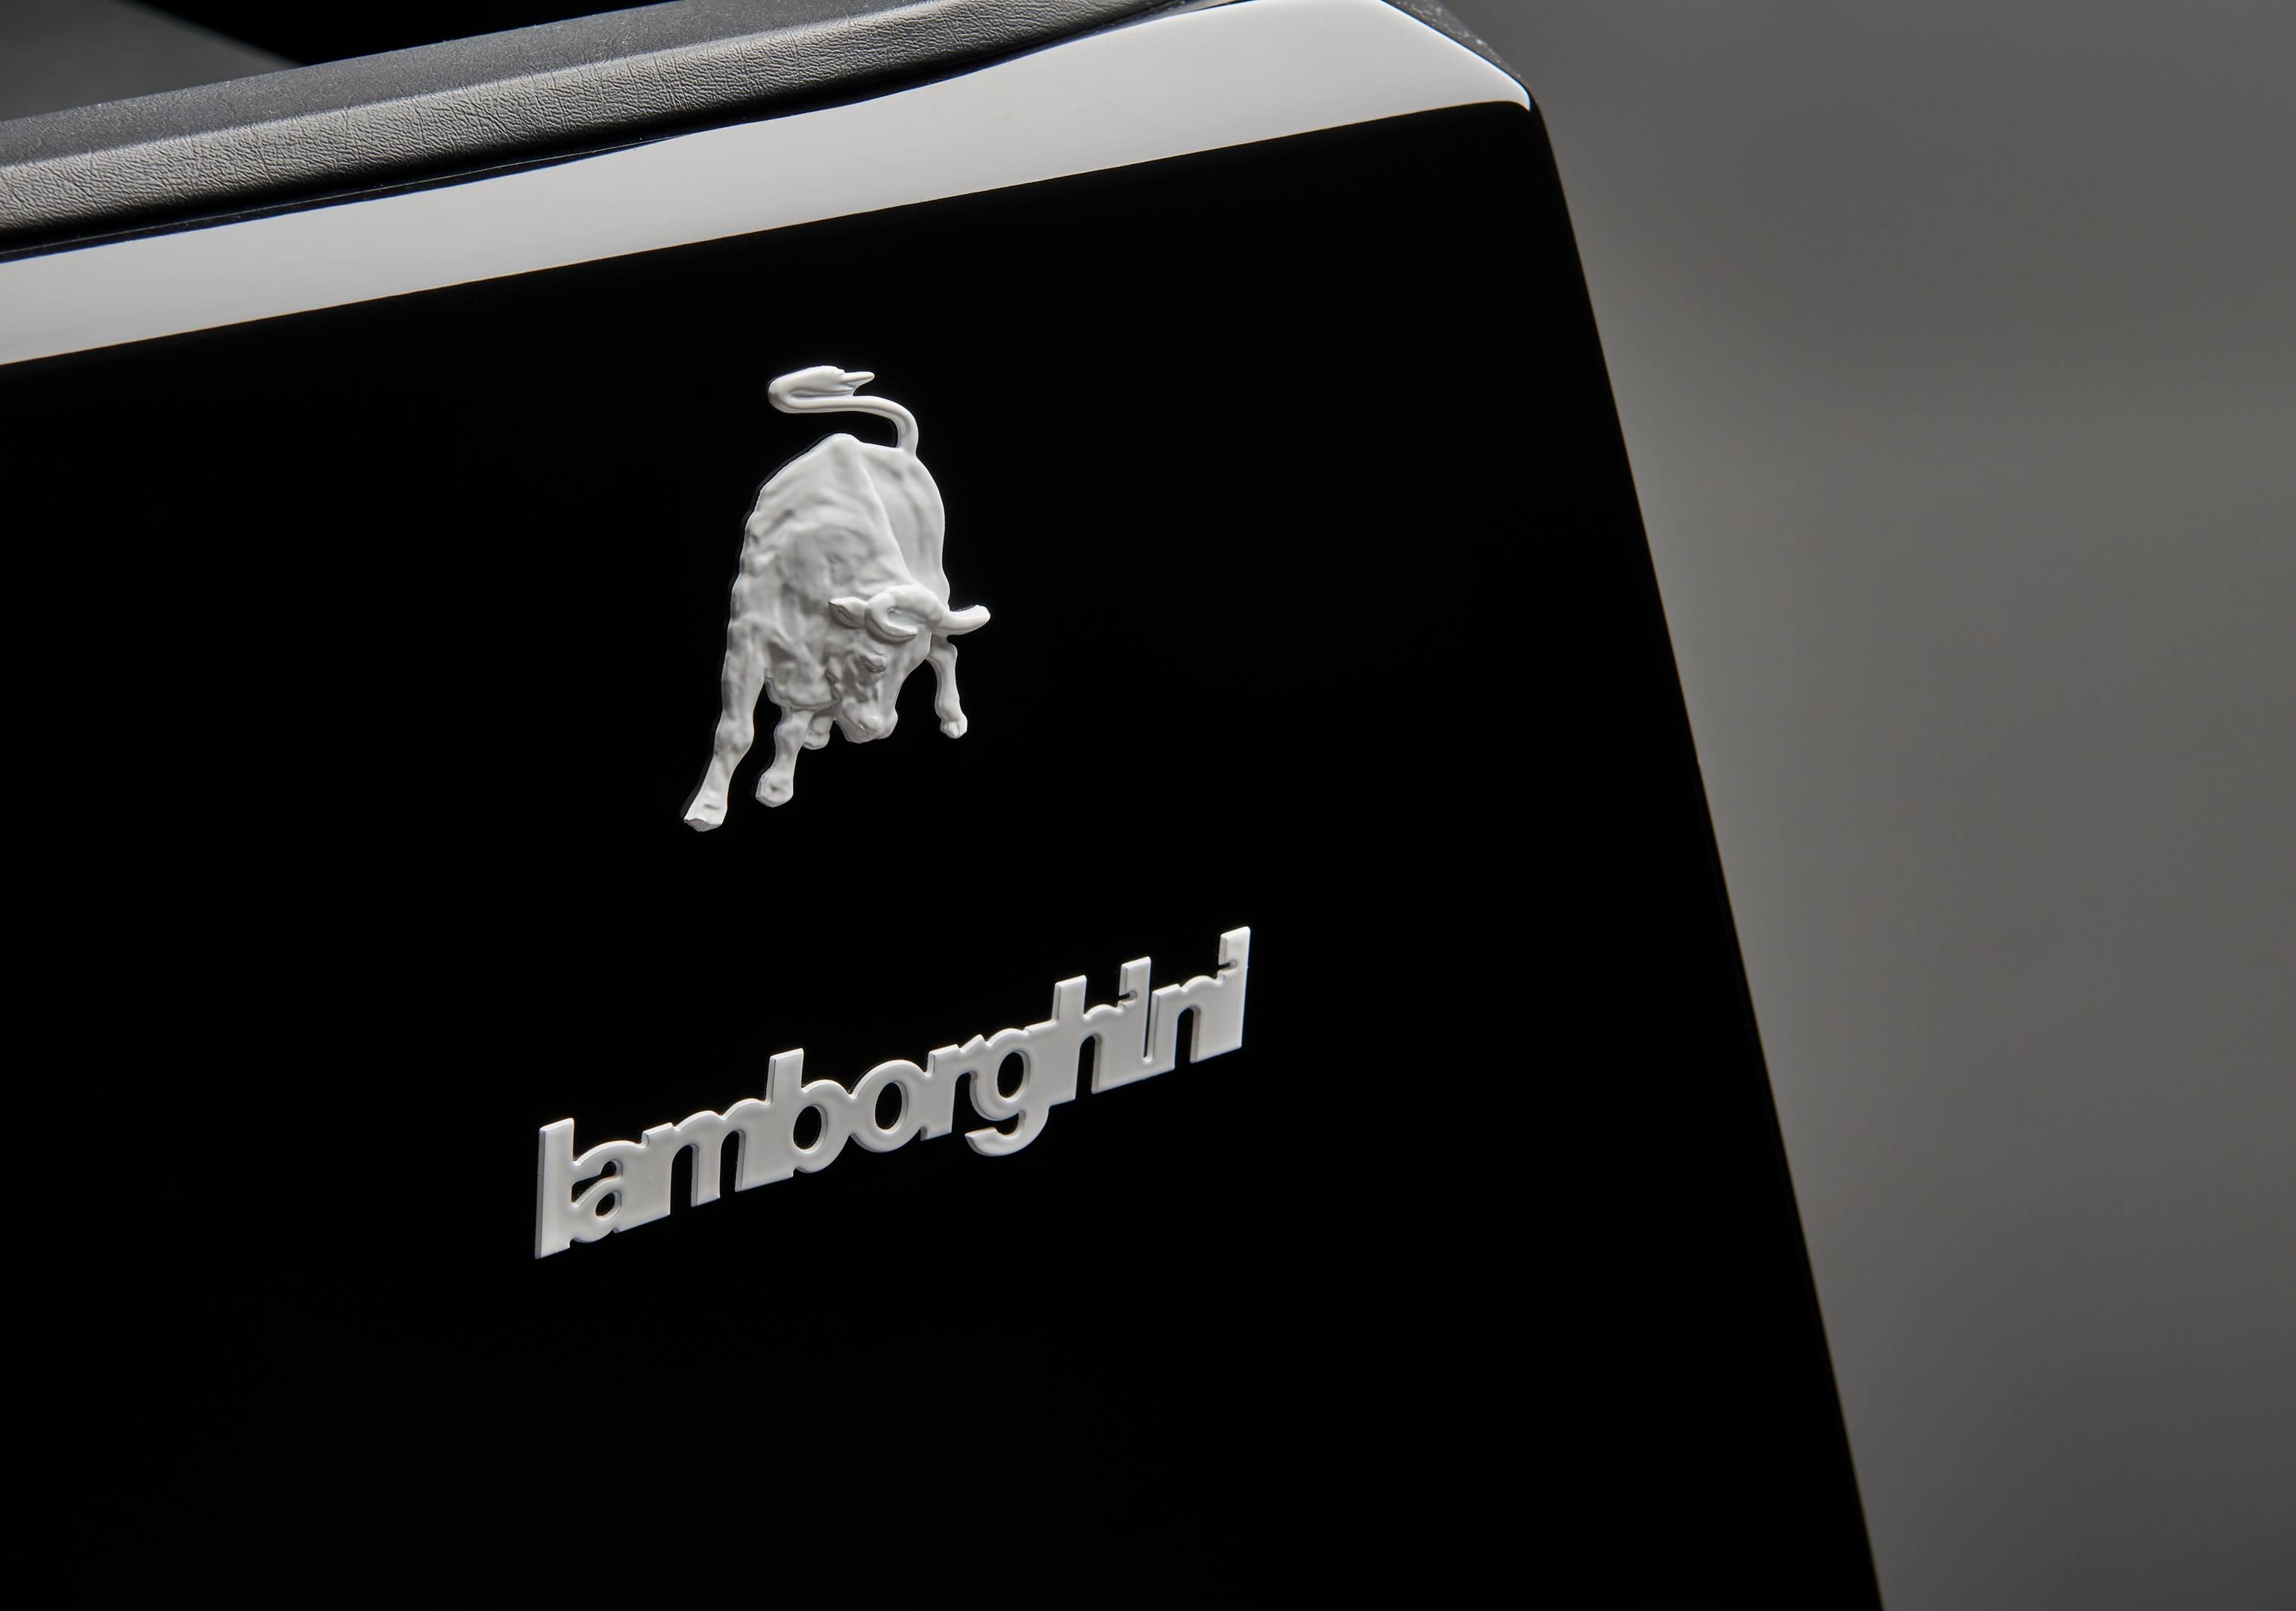 Lamborghini LM002 owners manual